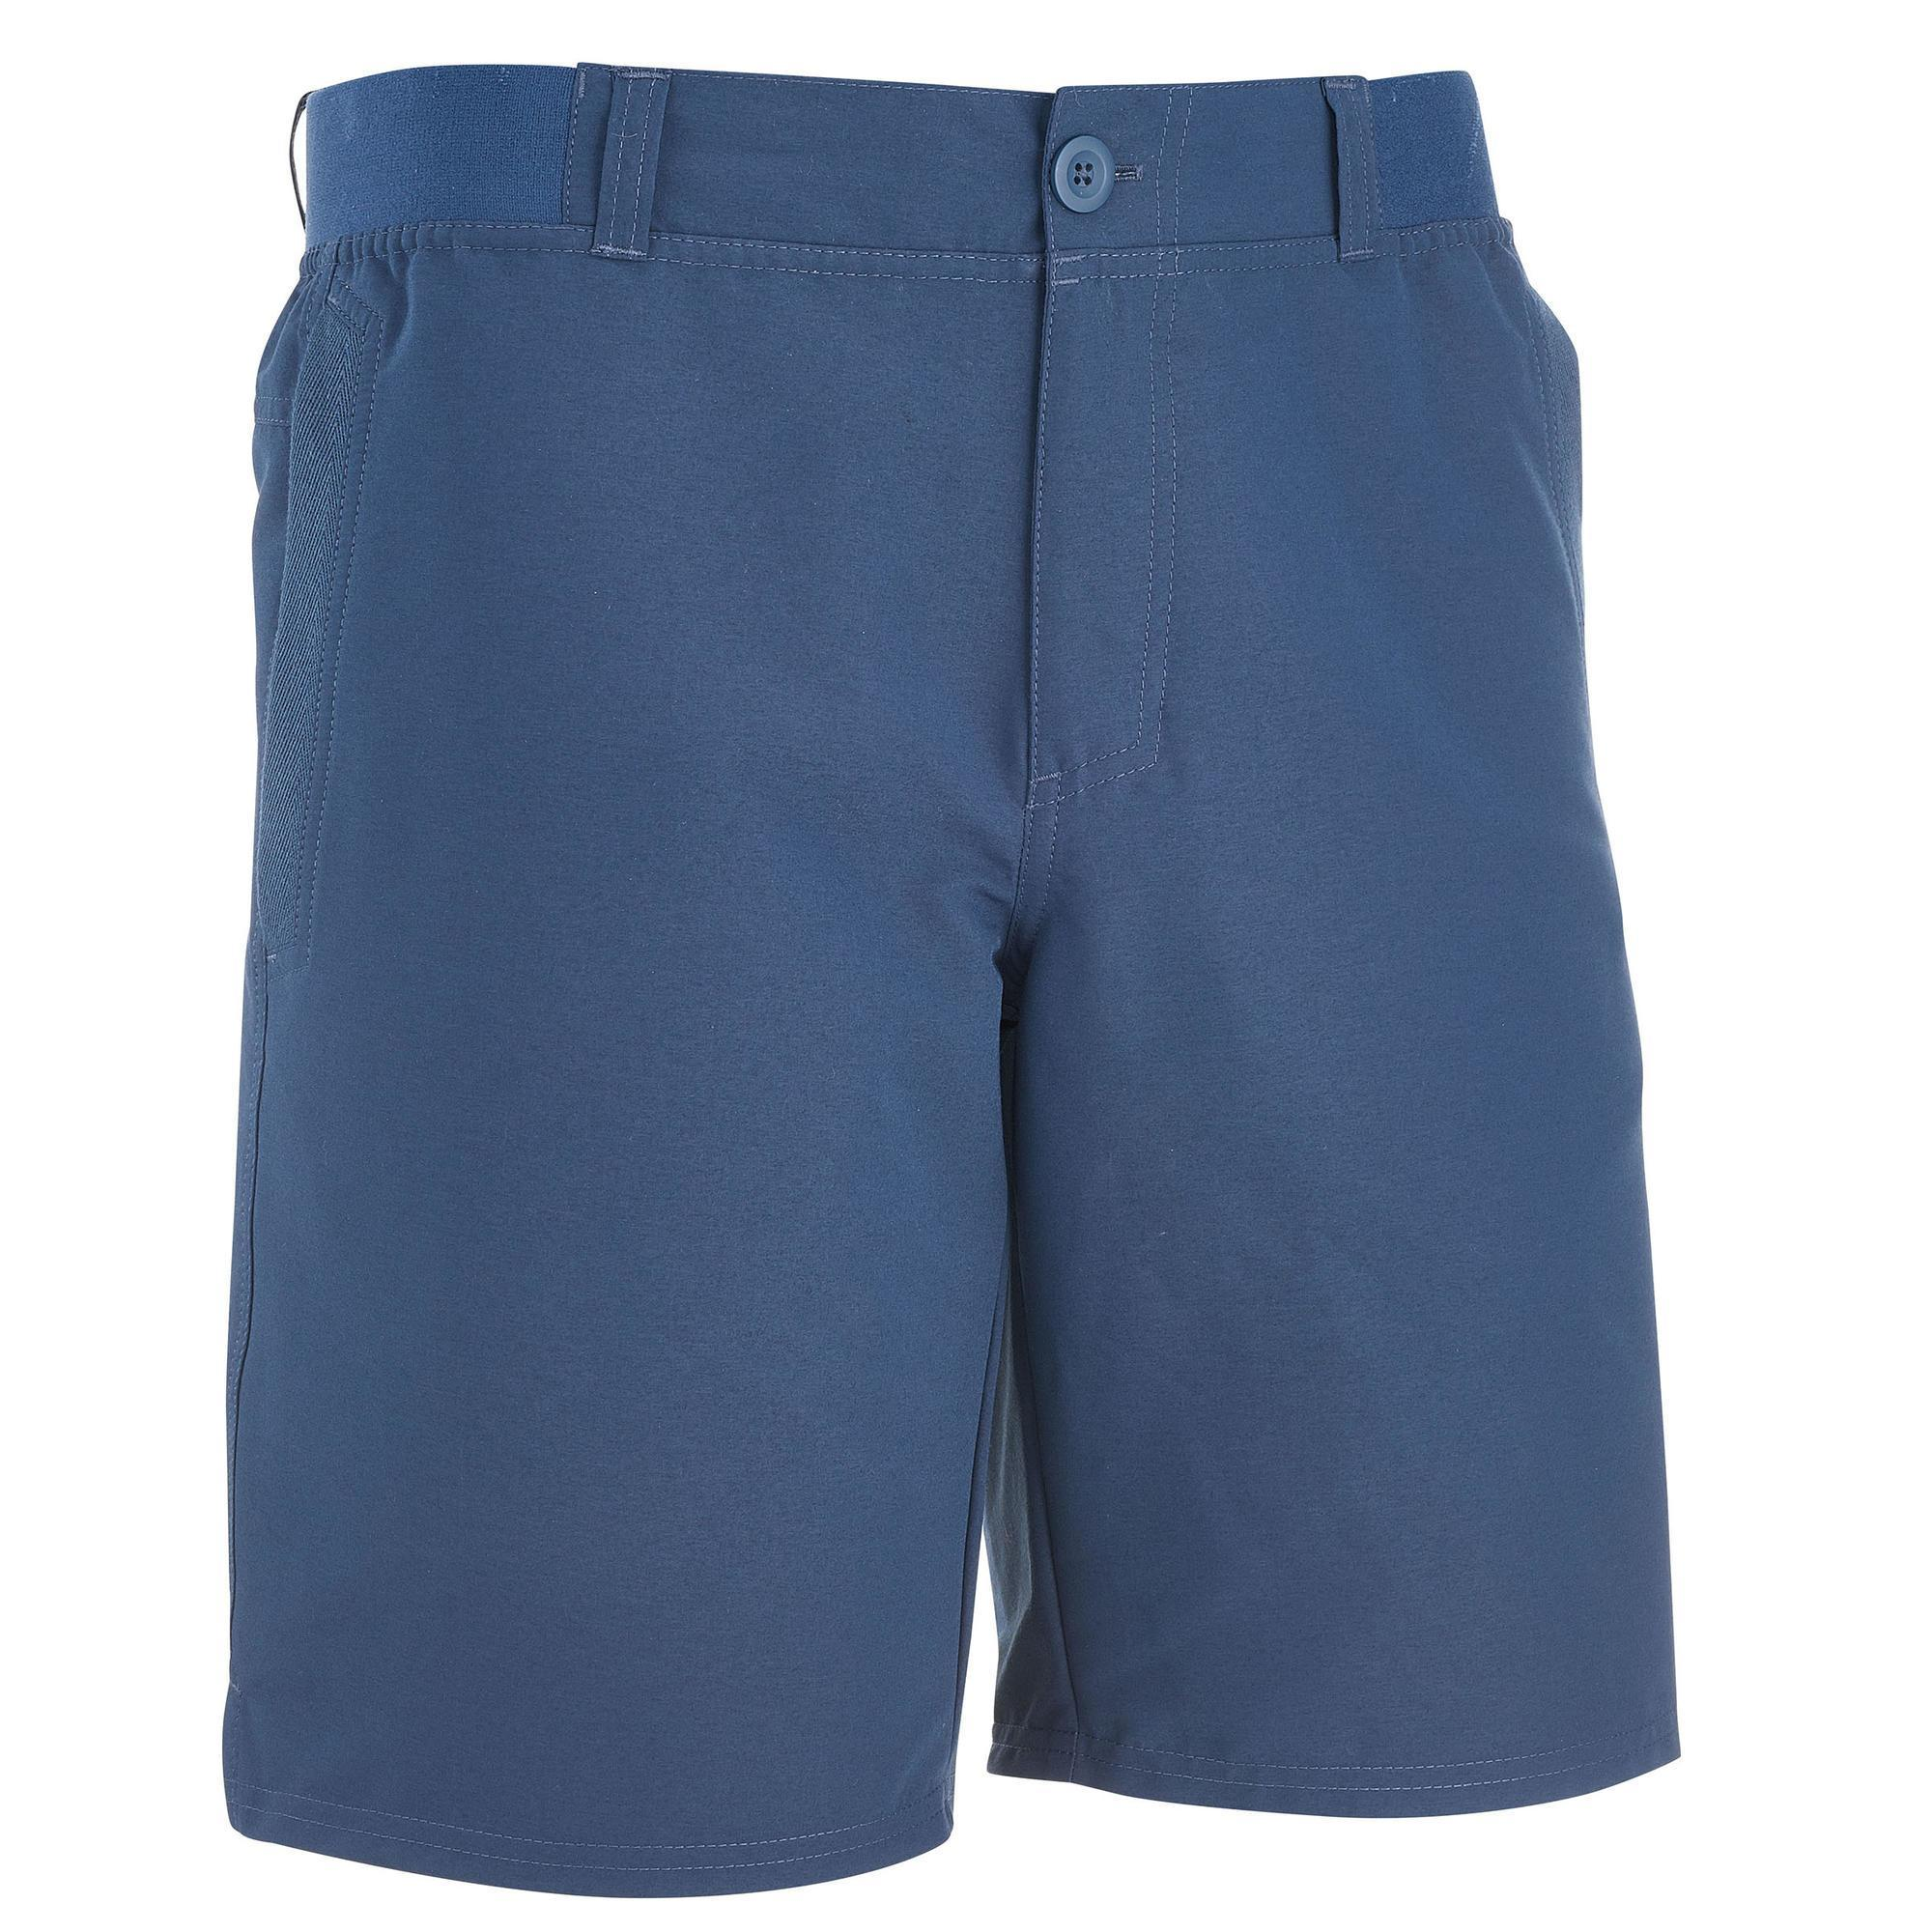 Shorts et jupes de randonnée  031a812ffa8